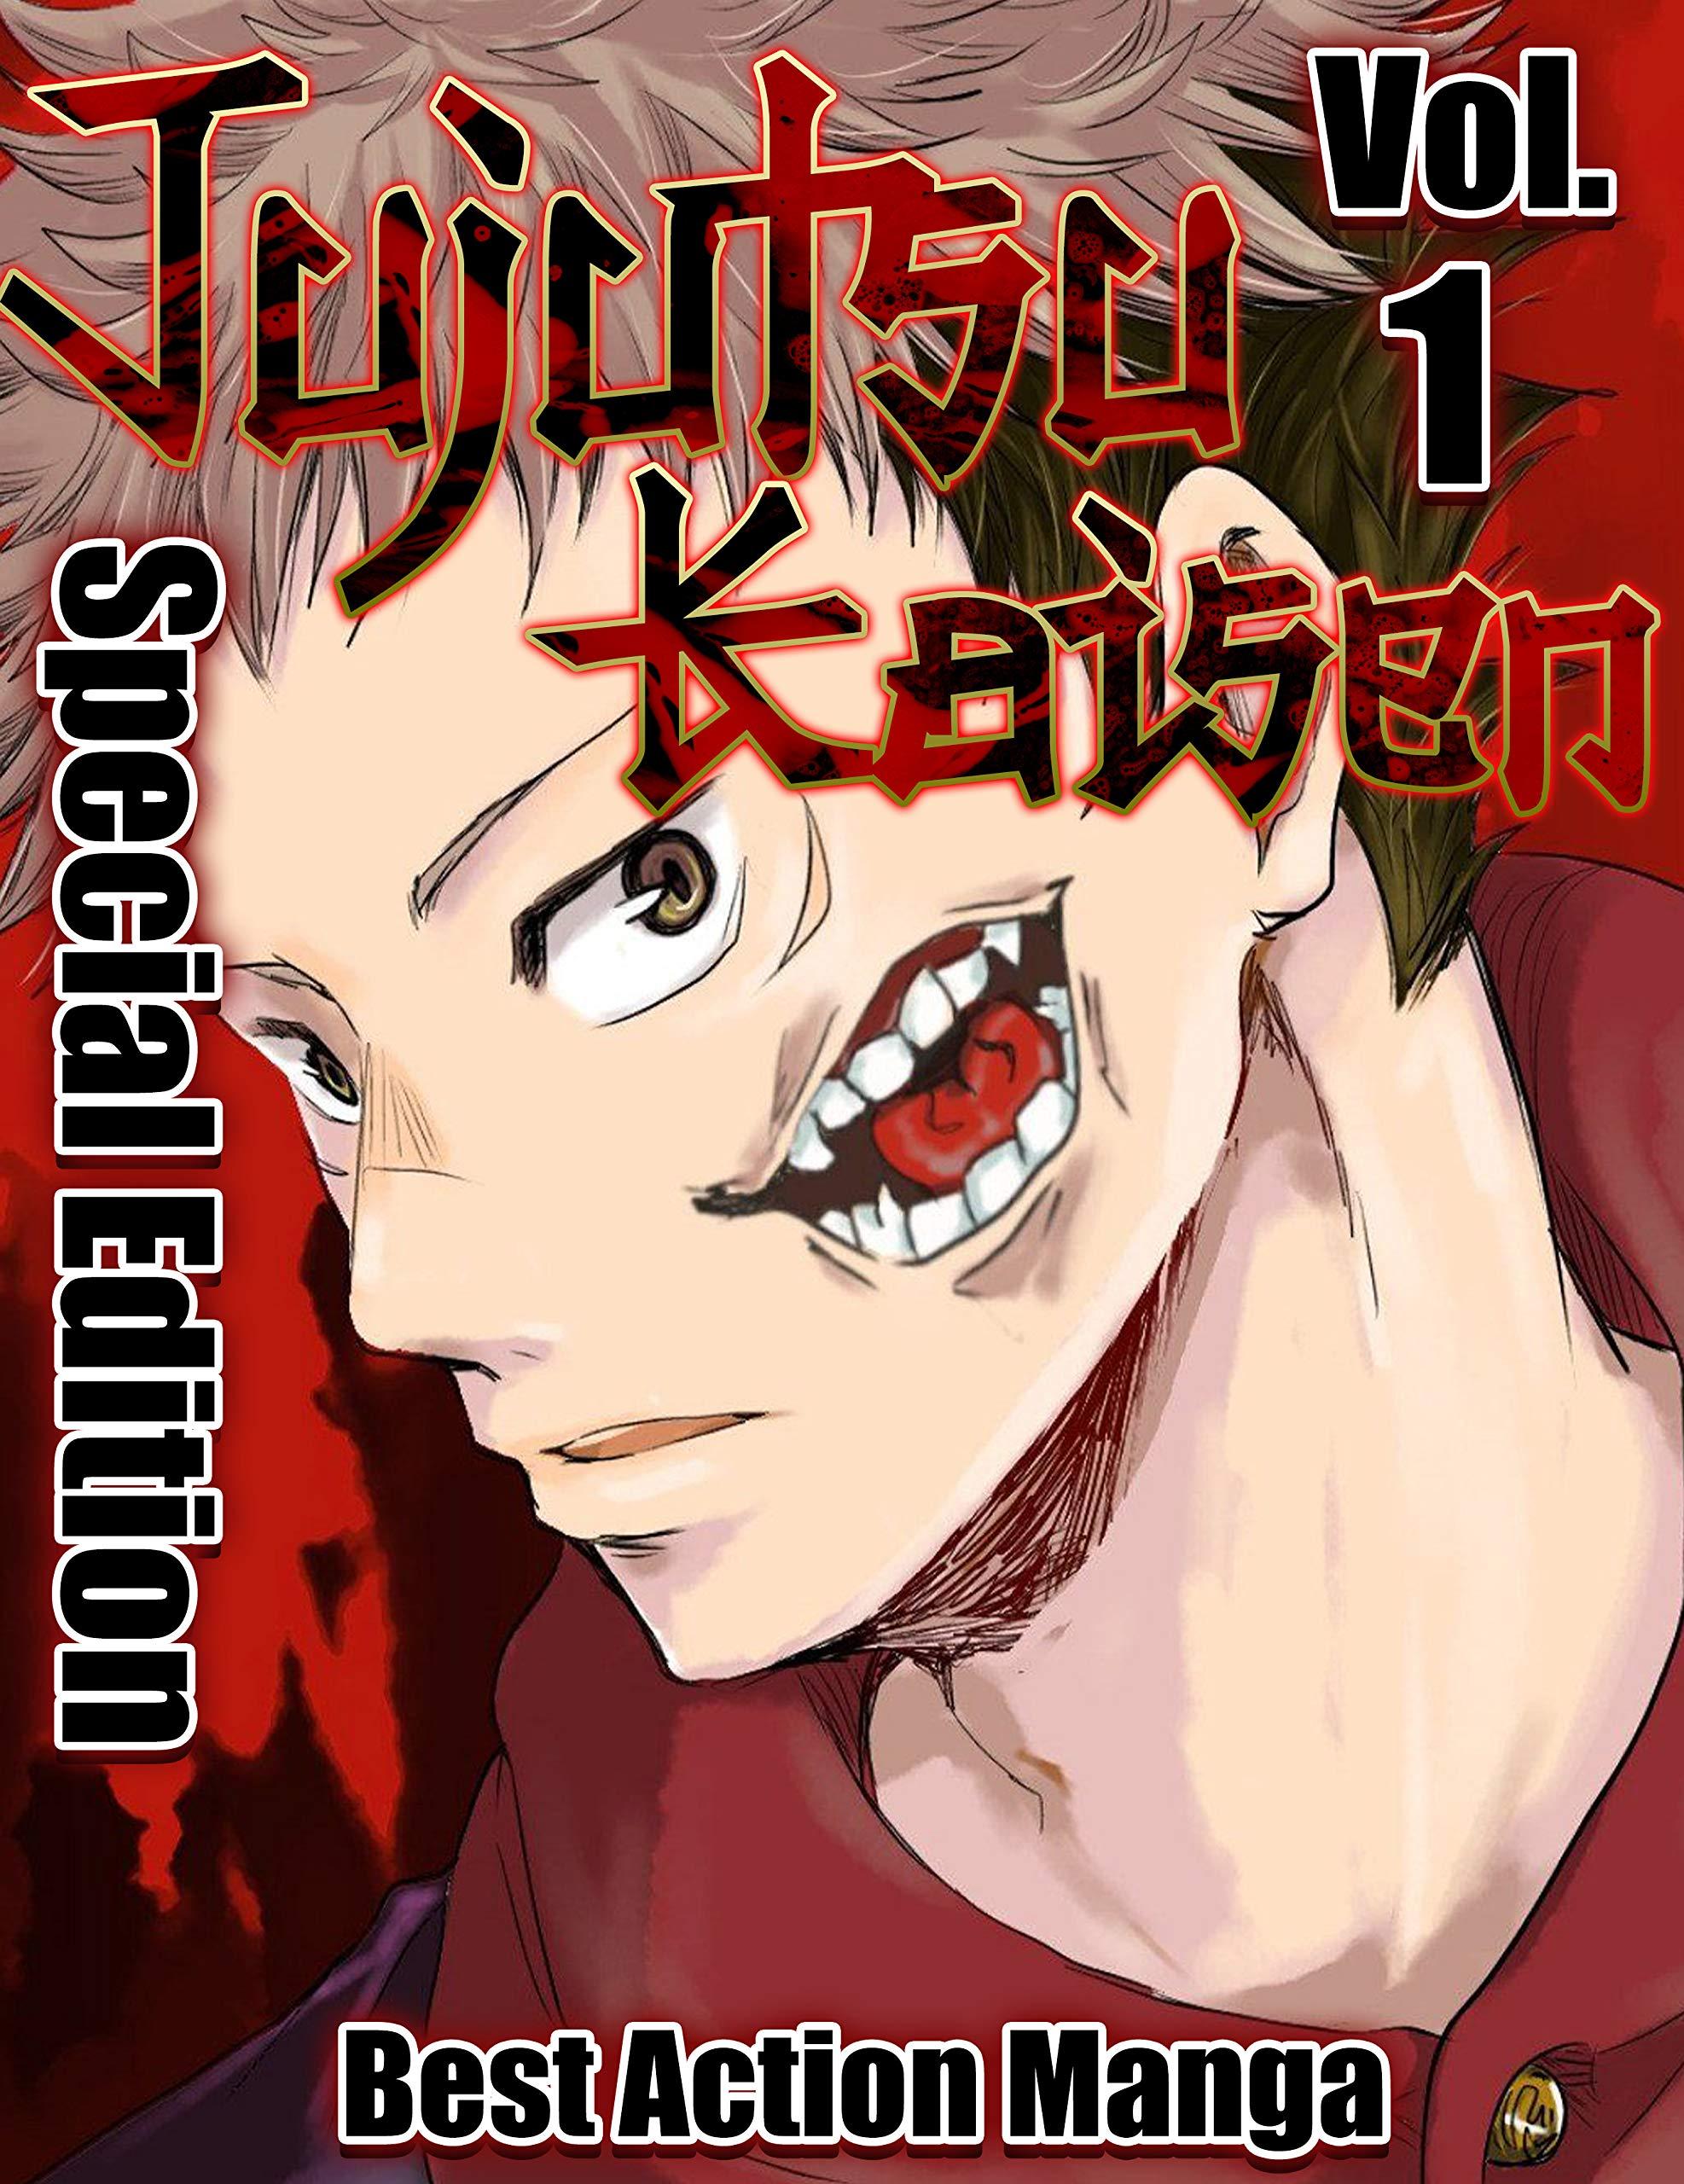 Best Action Manga Jujutsu Kaisen Special Edition: Limited Edition Jujutsu Kaisen Vol 1